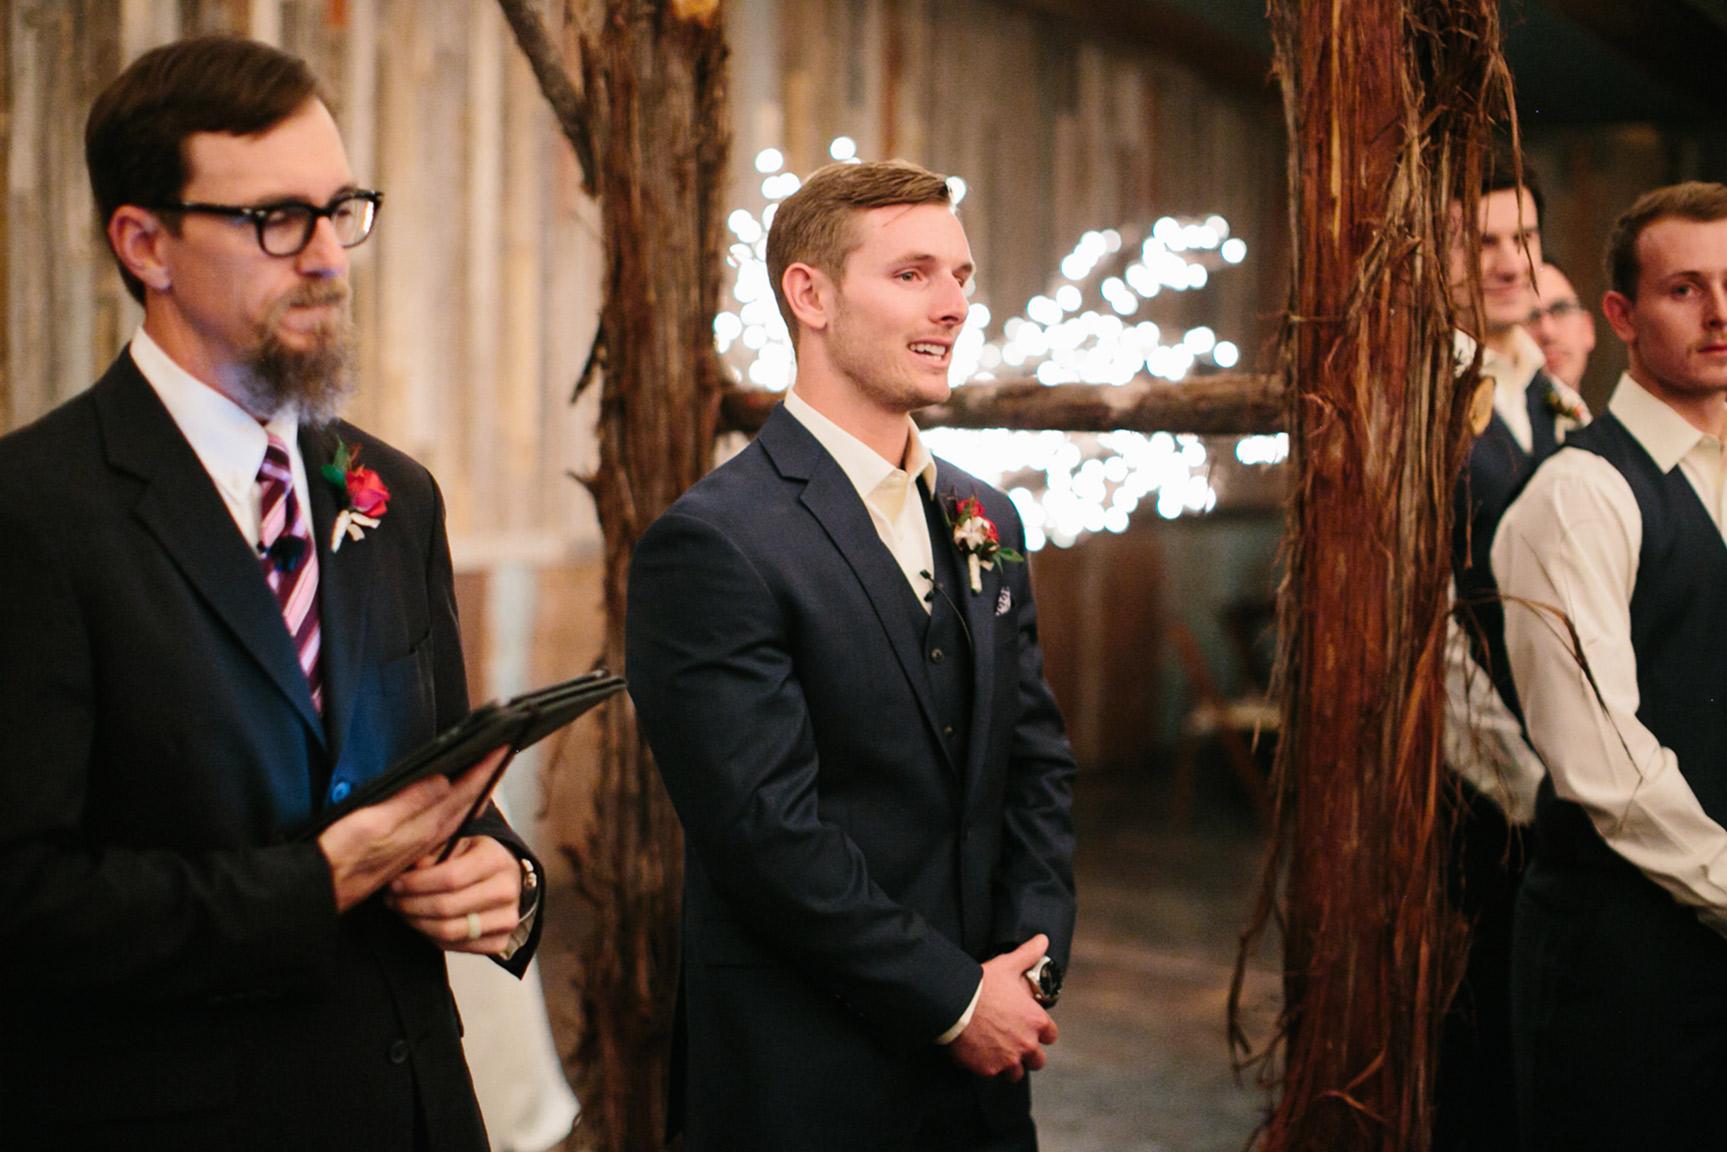 Cotton_Creek_Barn_Winter_Wedding_WeddingPhotographer045.jpg